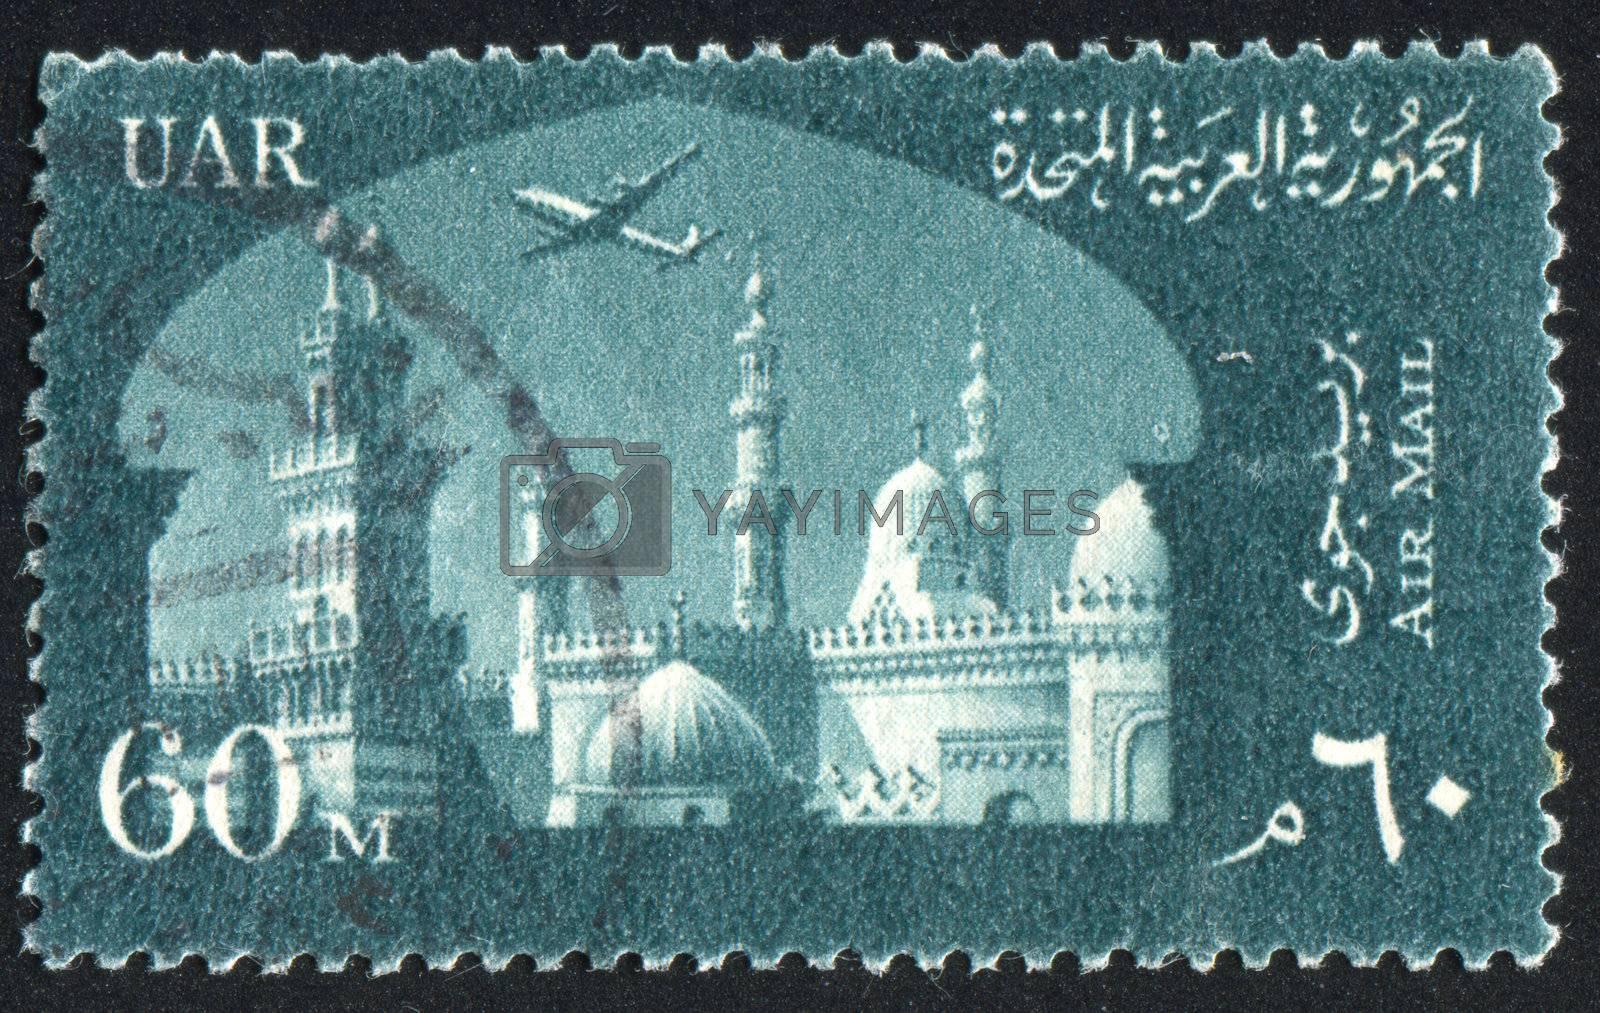 EGYPT - CIRCA 1959: stamp printed by Egypt, shows Azhar University, circa 1959.